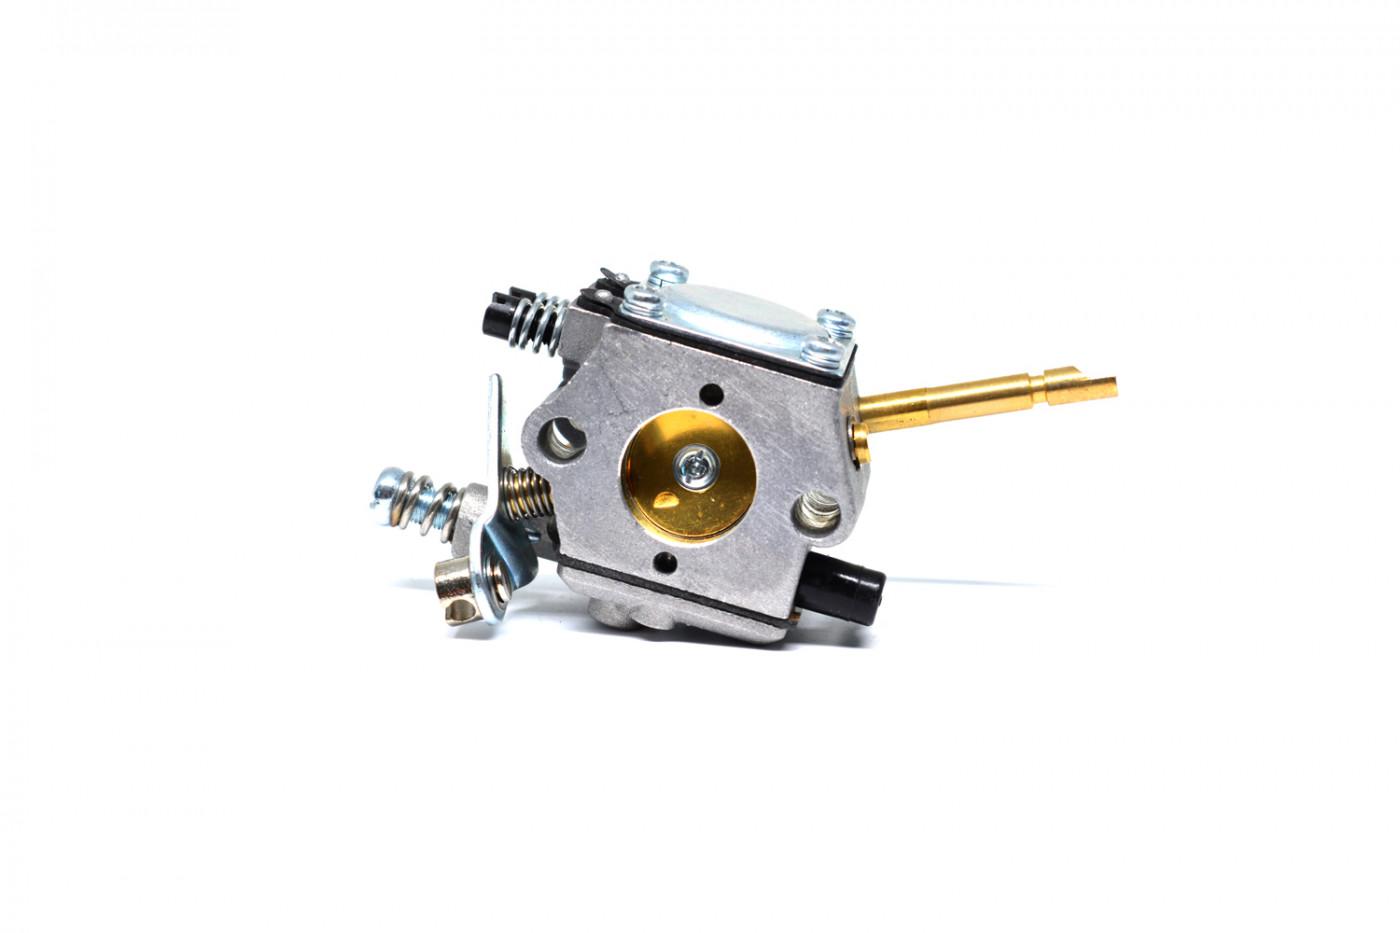 Karburátor Stihl FS50 FS51 FS61 FS65 FS66 FS90